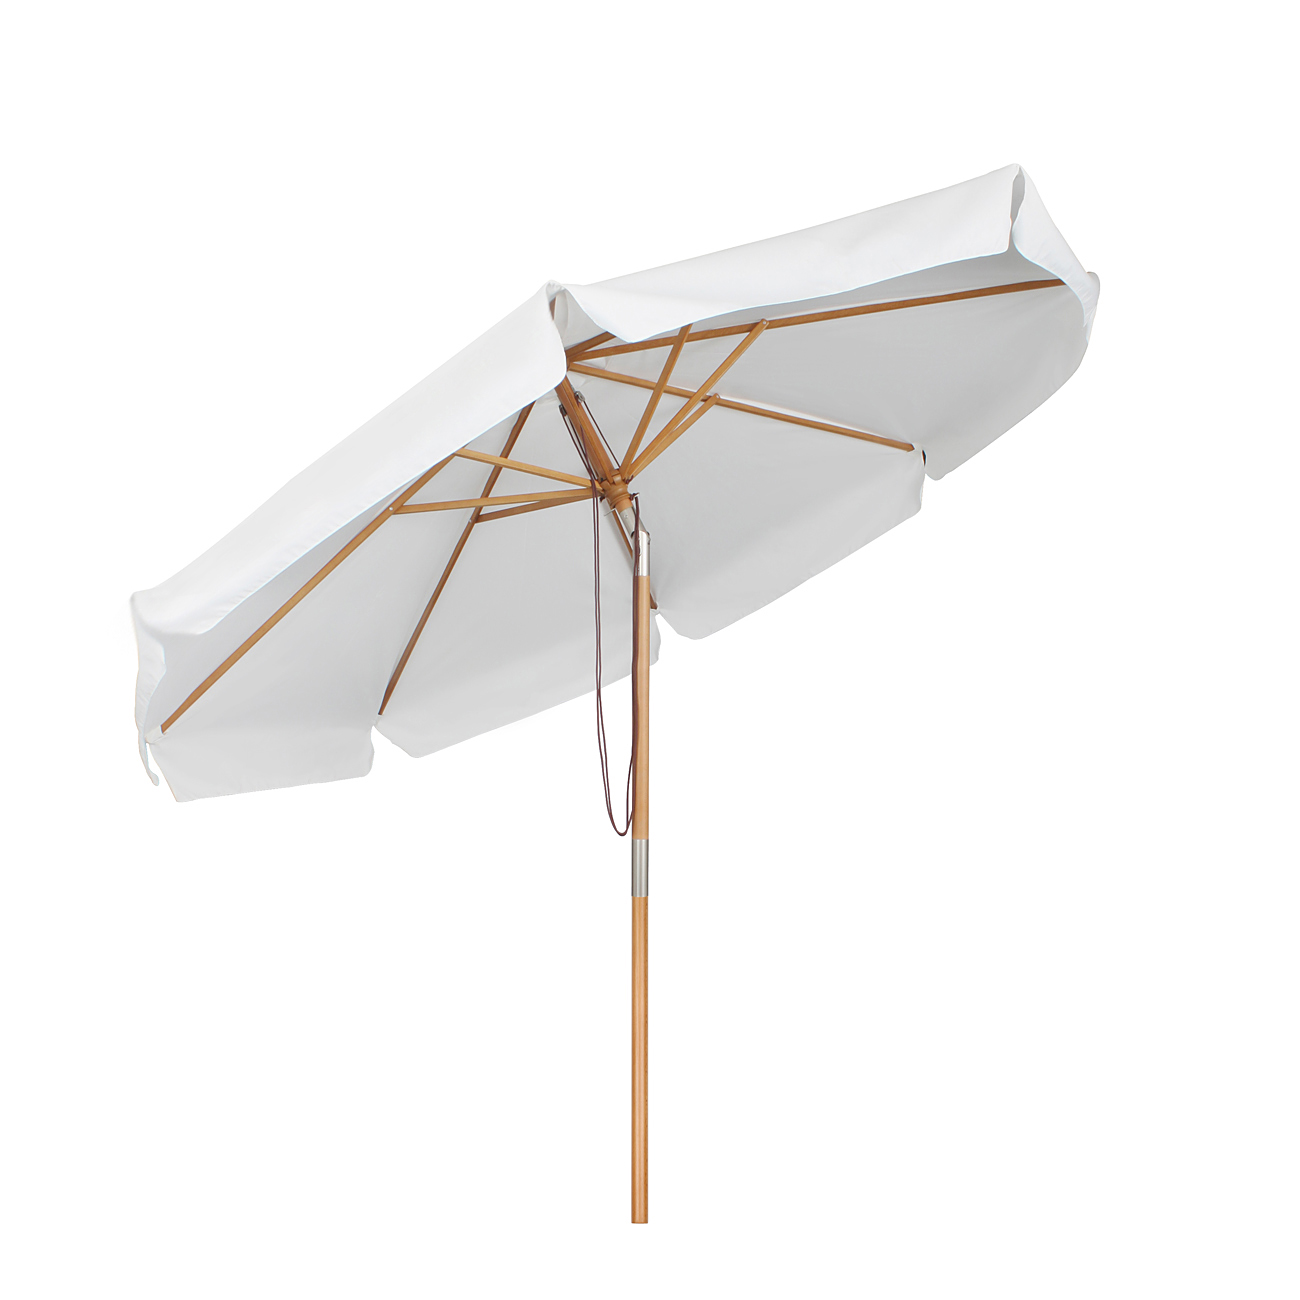 3m sonnenschirm sonnenschutz holz ampelschirm strandschirm gartenschirm wei ebay. Black Bedroom Furniture Sets. Home Design Ideas